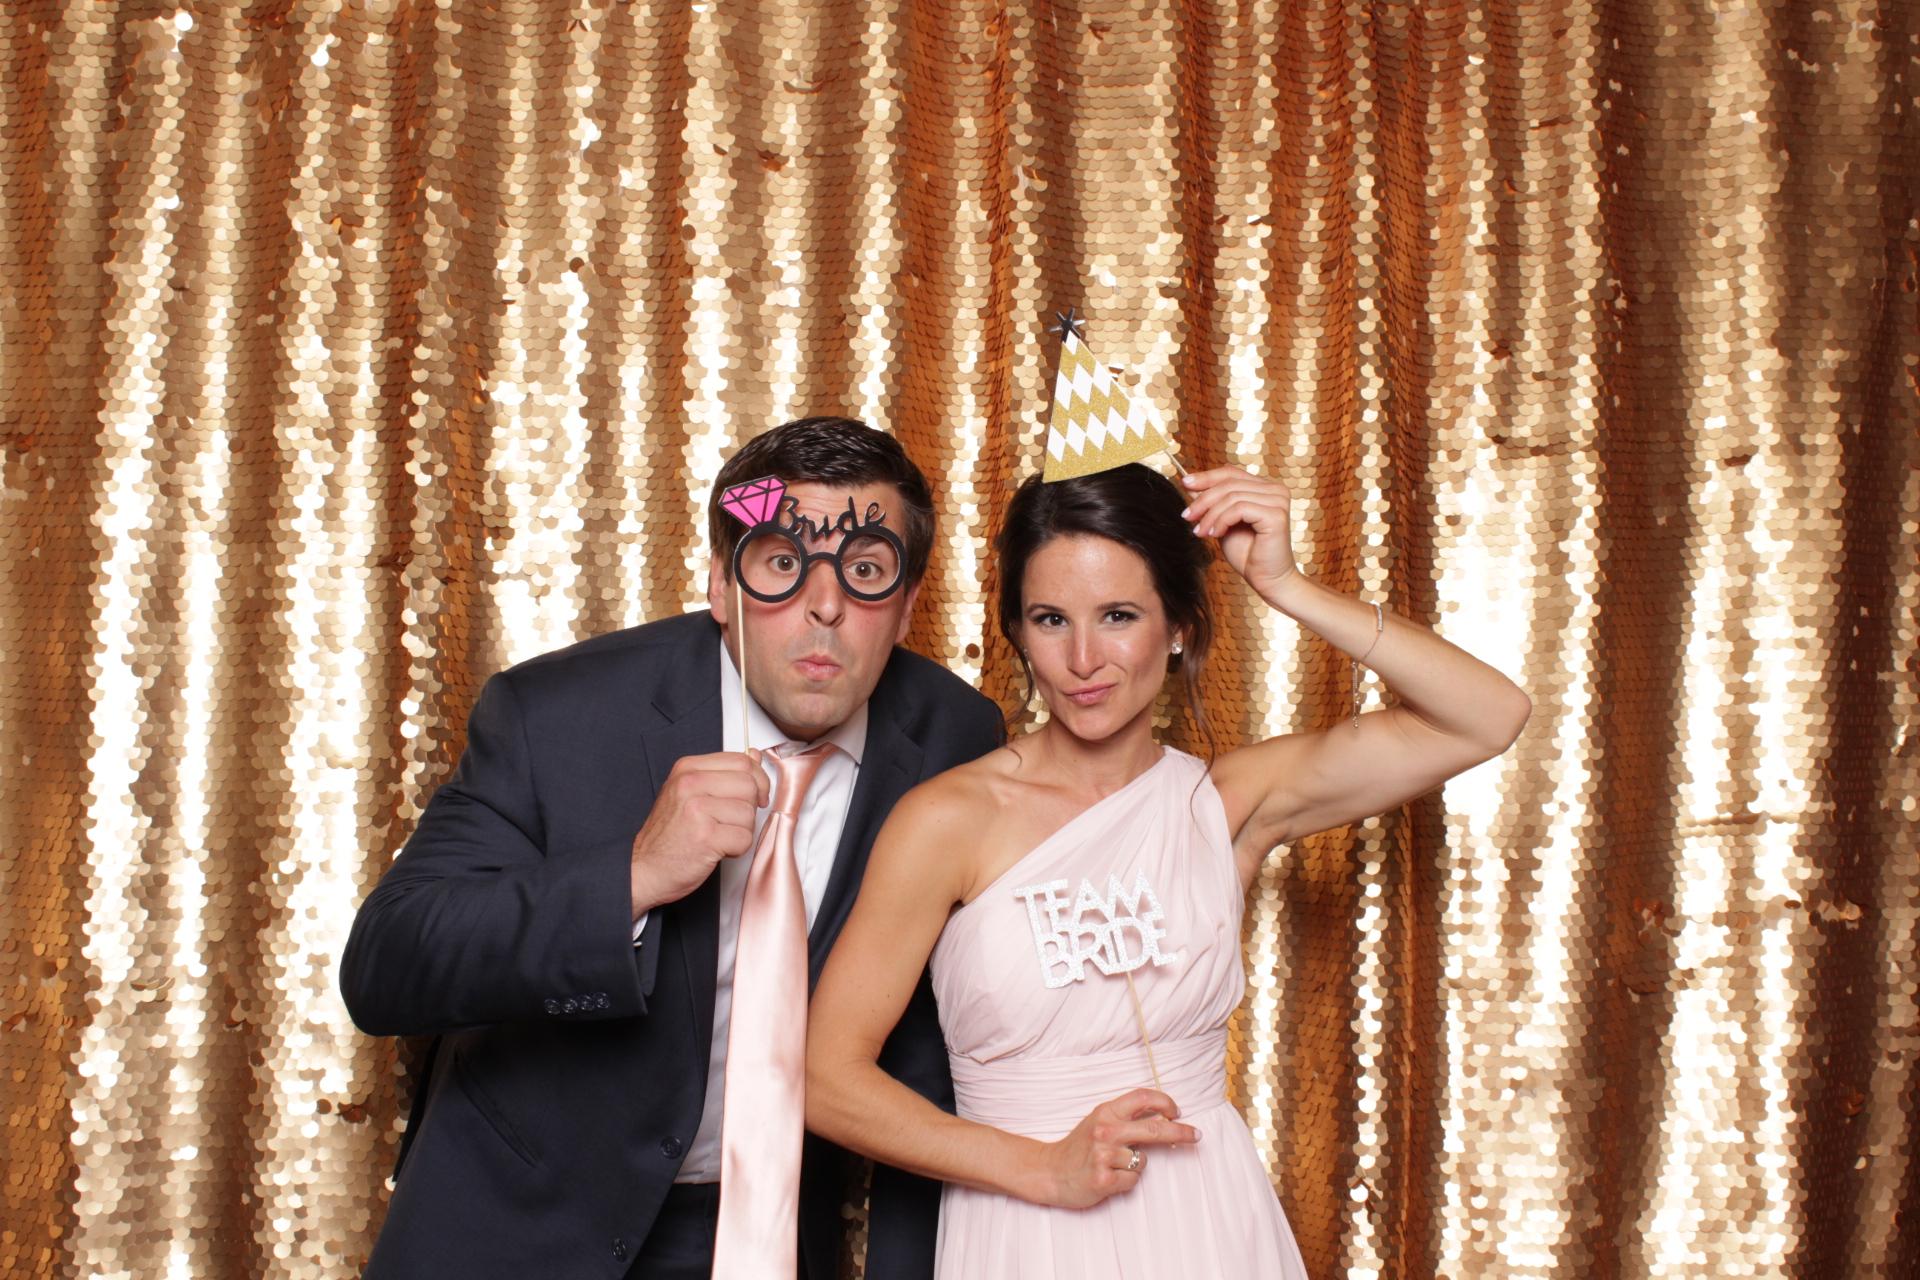 Minneapolis_wedding_photo_booth_Machine_Shop (20).jpg